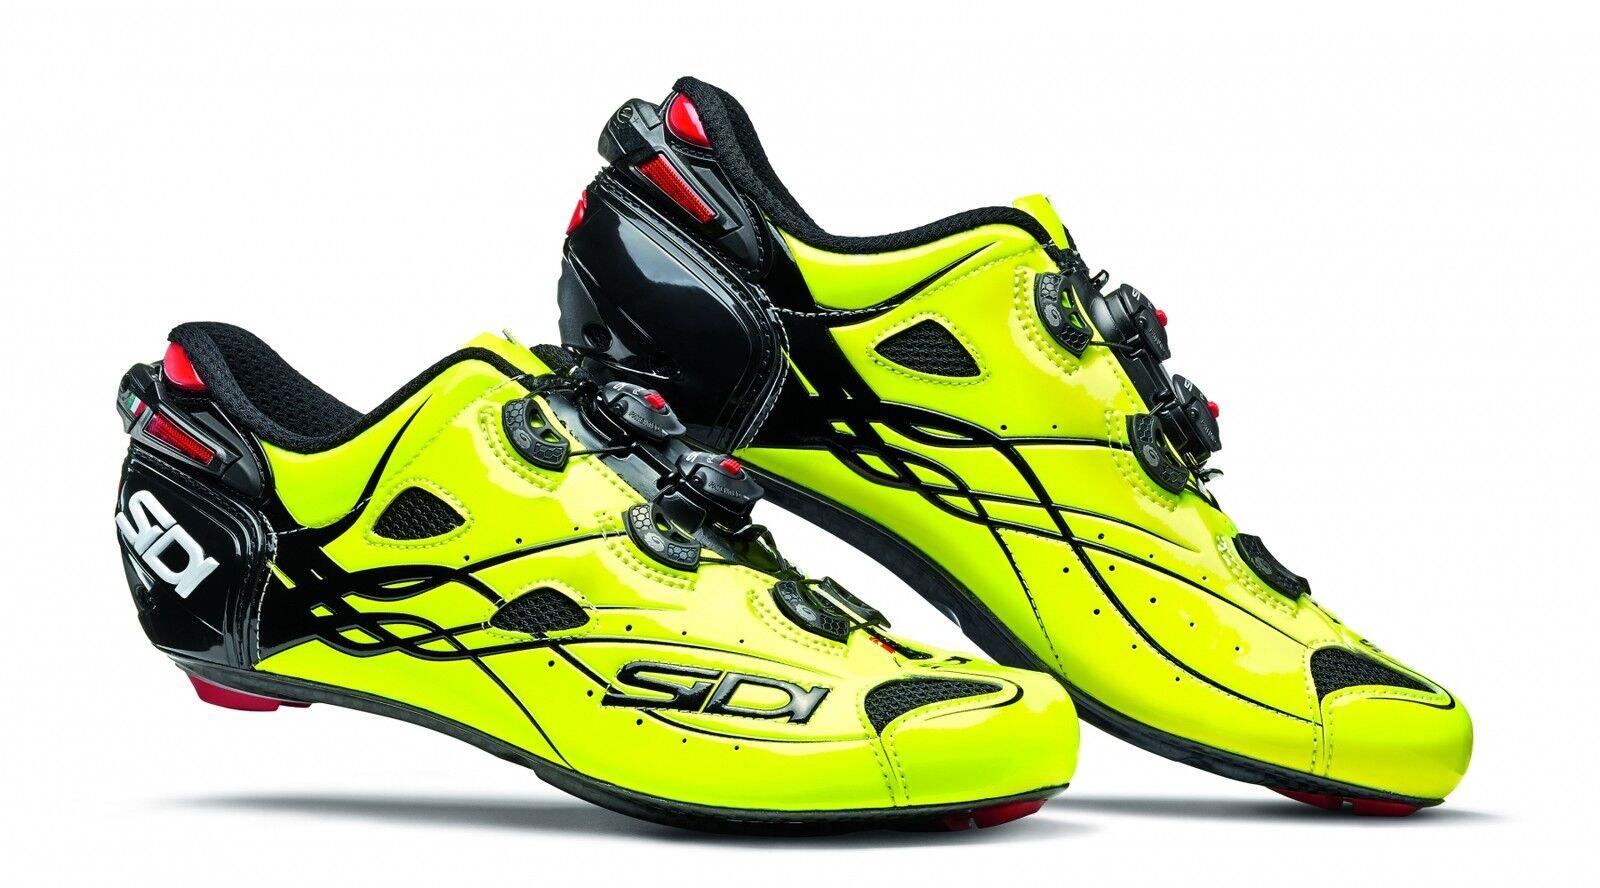 Schuhe Bici Da Corsa SIDI Shot Carbon Per Bicicletta Strada Road Sport Ciclismo